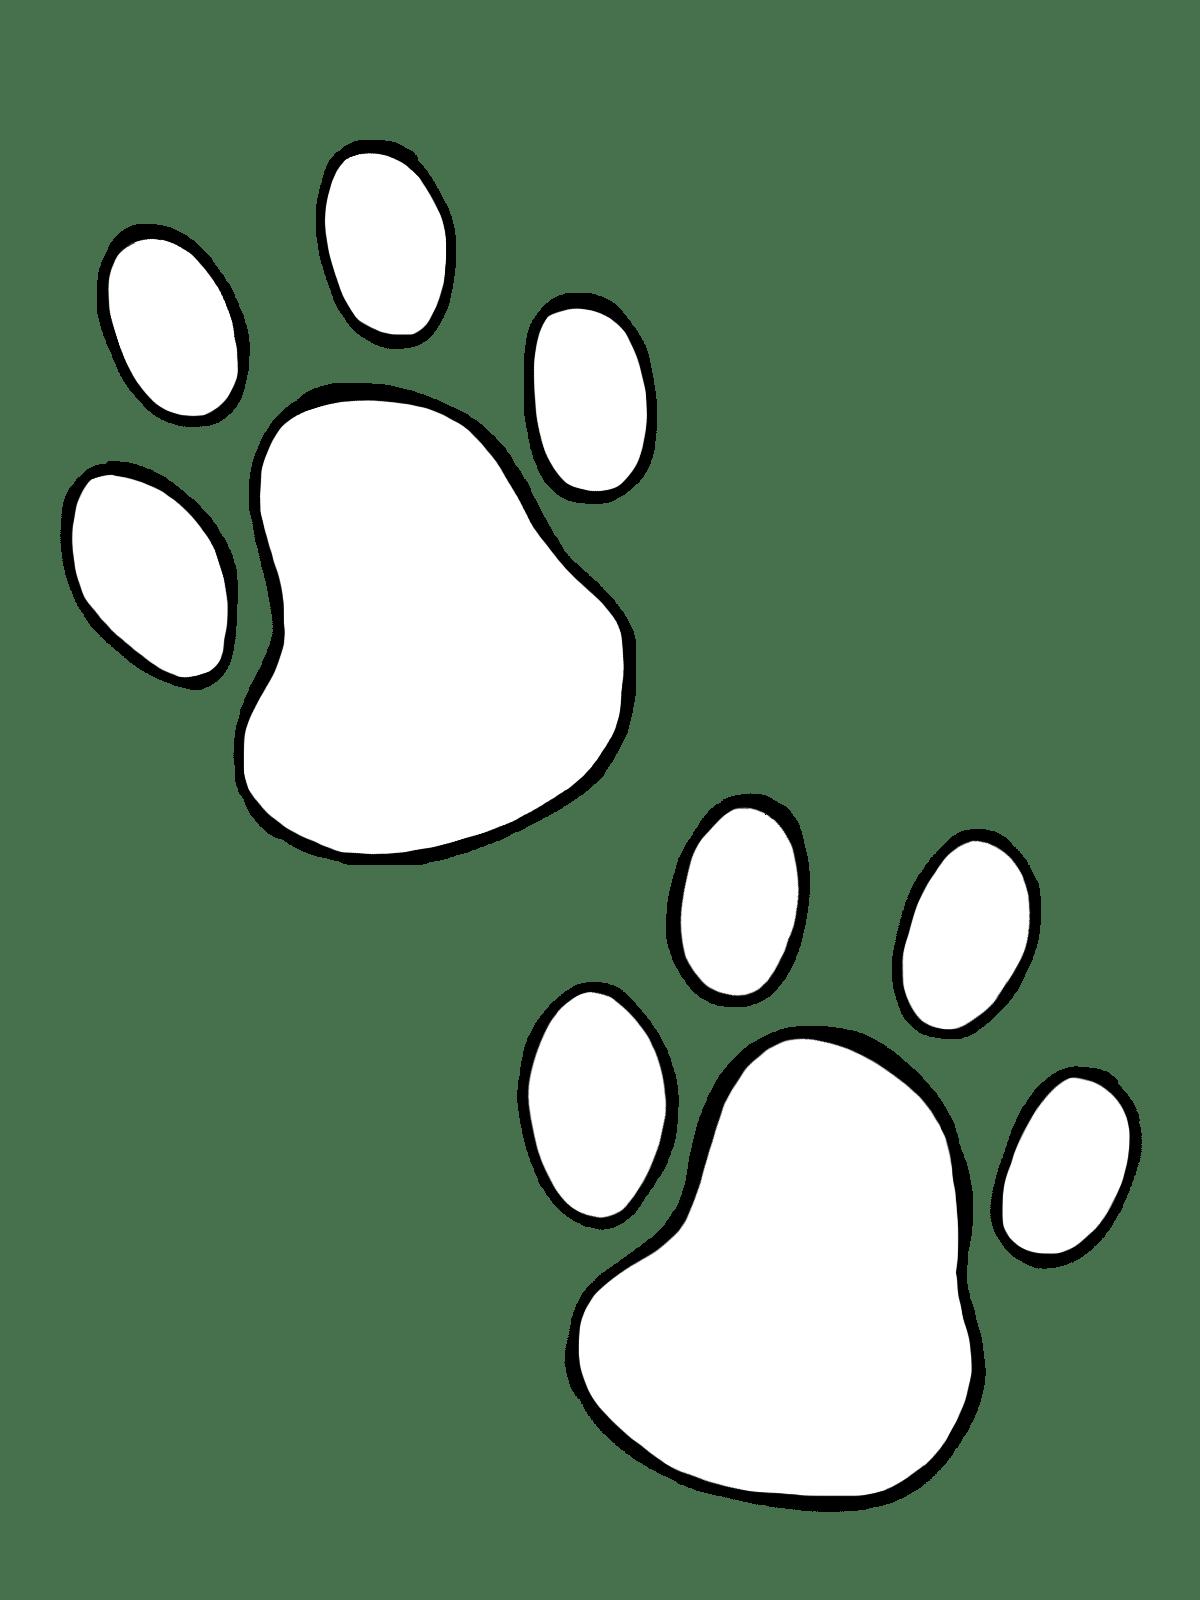 Dog Paw Clip Art Clipart Panda